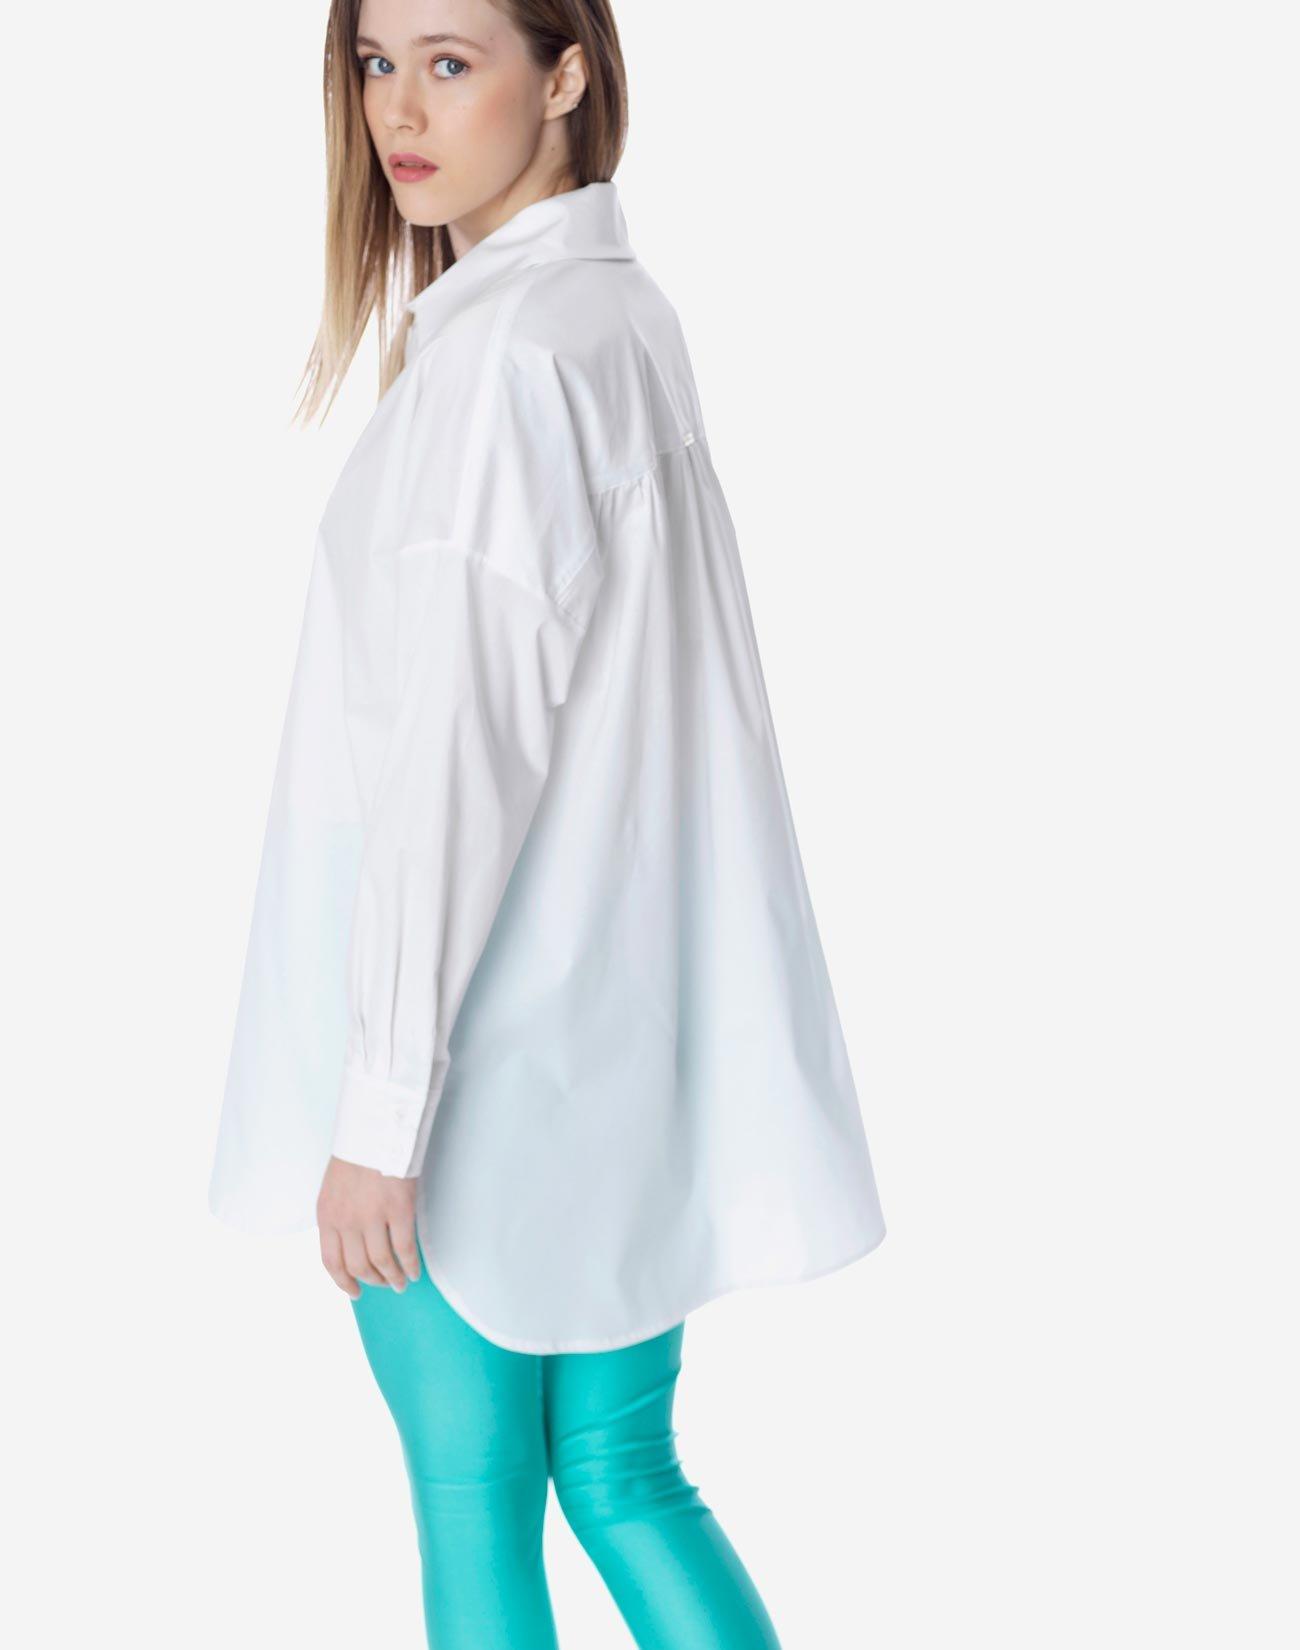 Ovesrized πουκάμισο